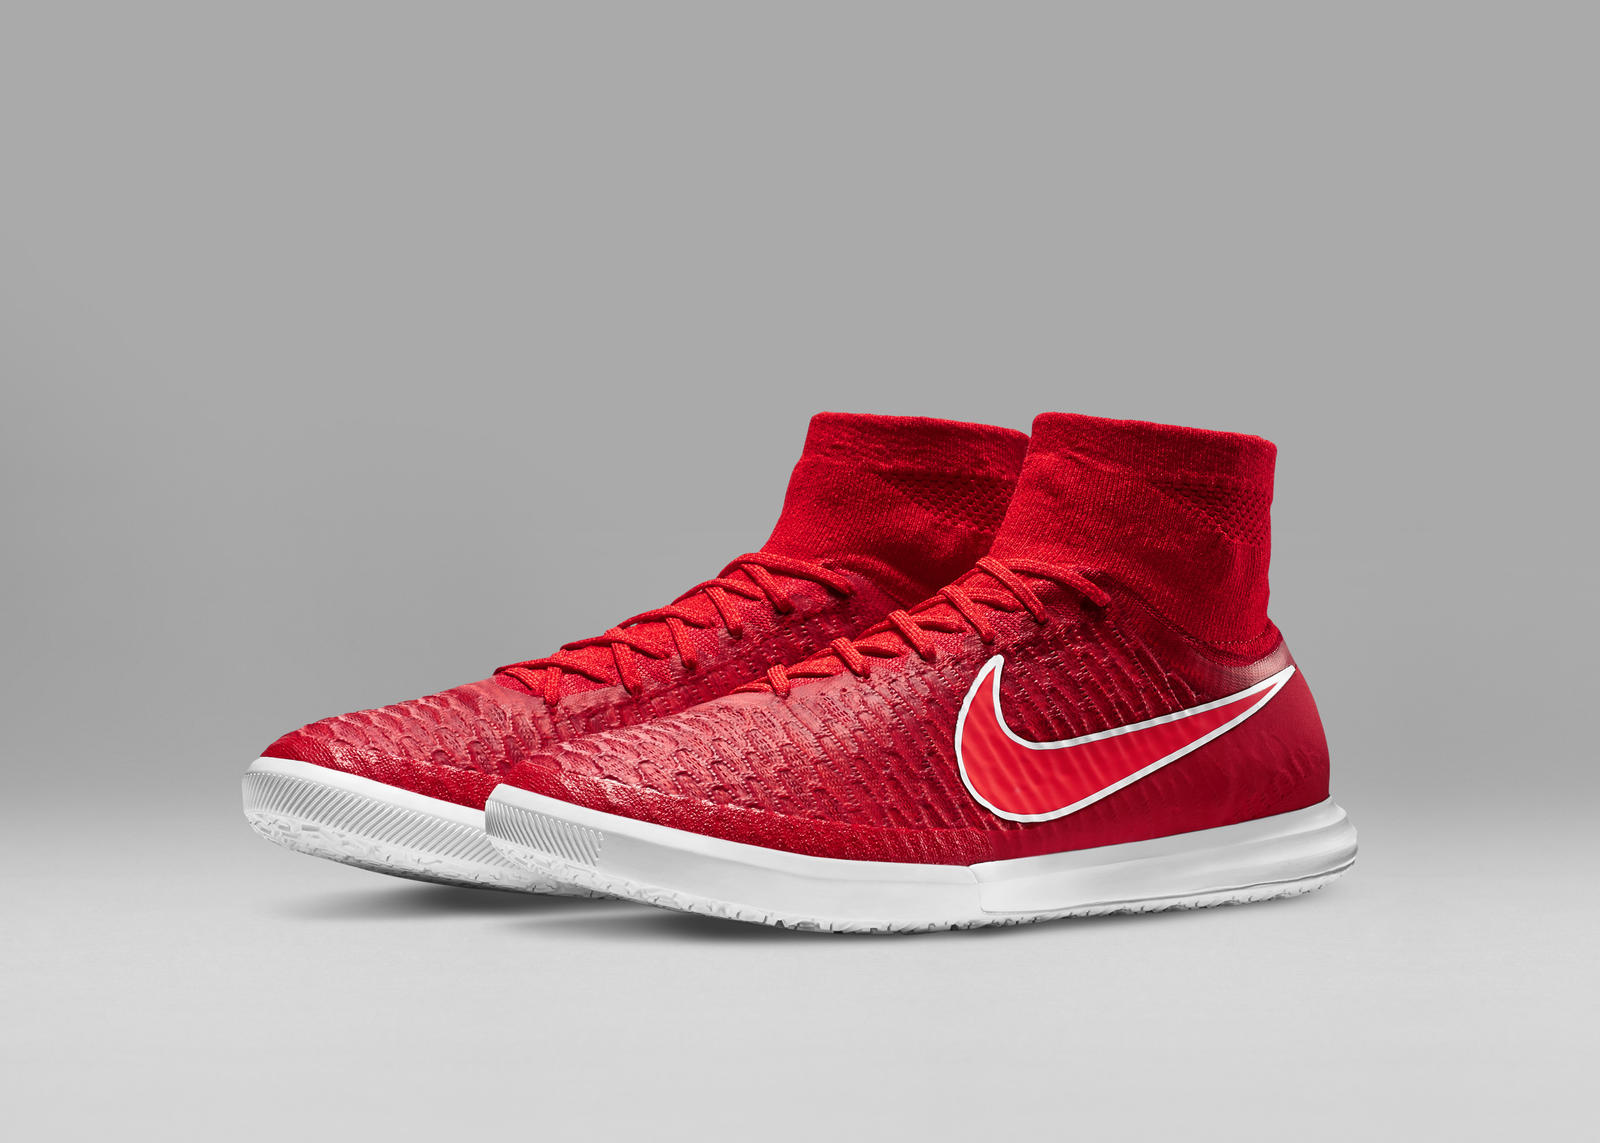 Nike-Football-Soccer_NFX_STREET_MAGISTAX_PROXIMO_IC_E_PREM